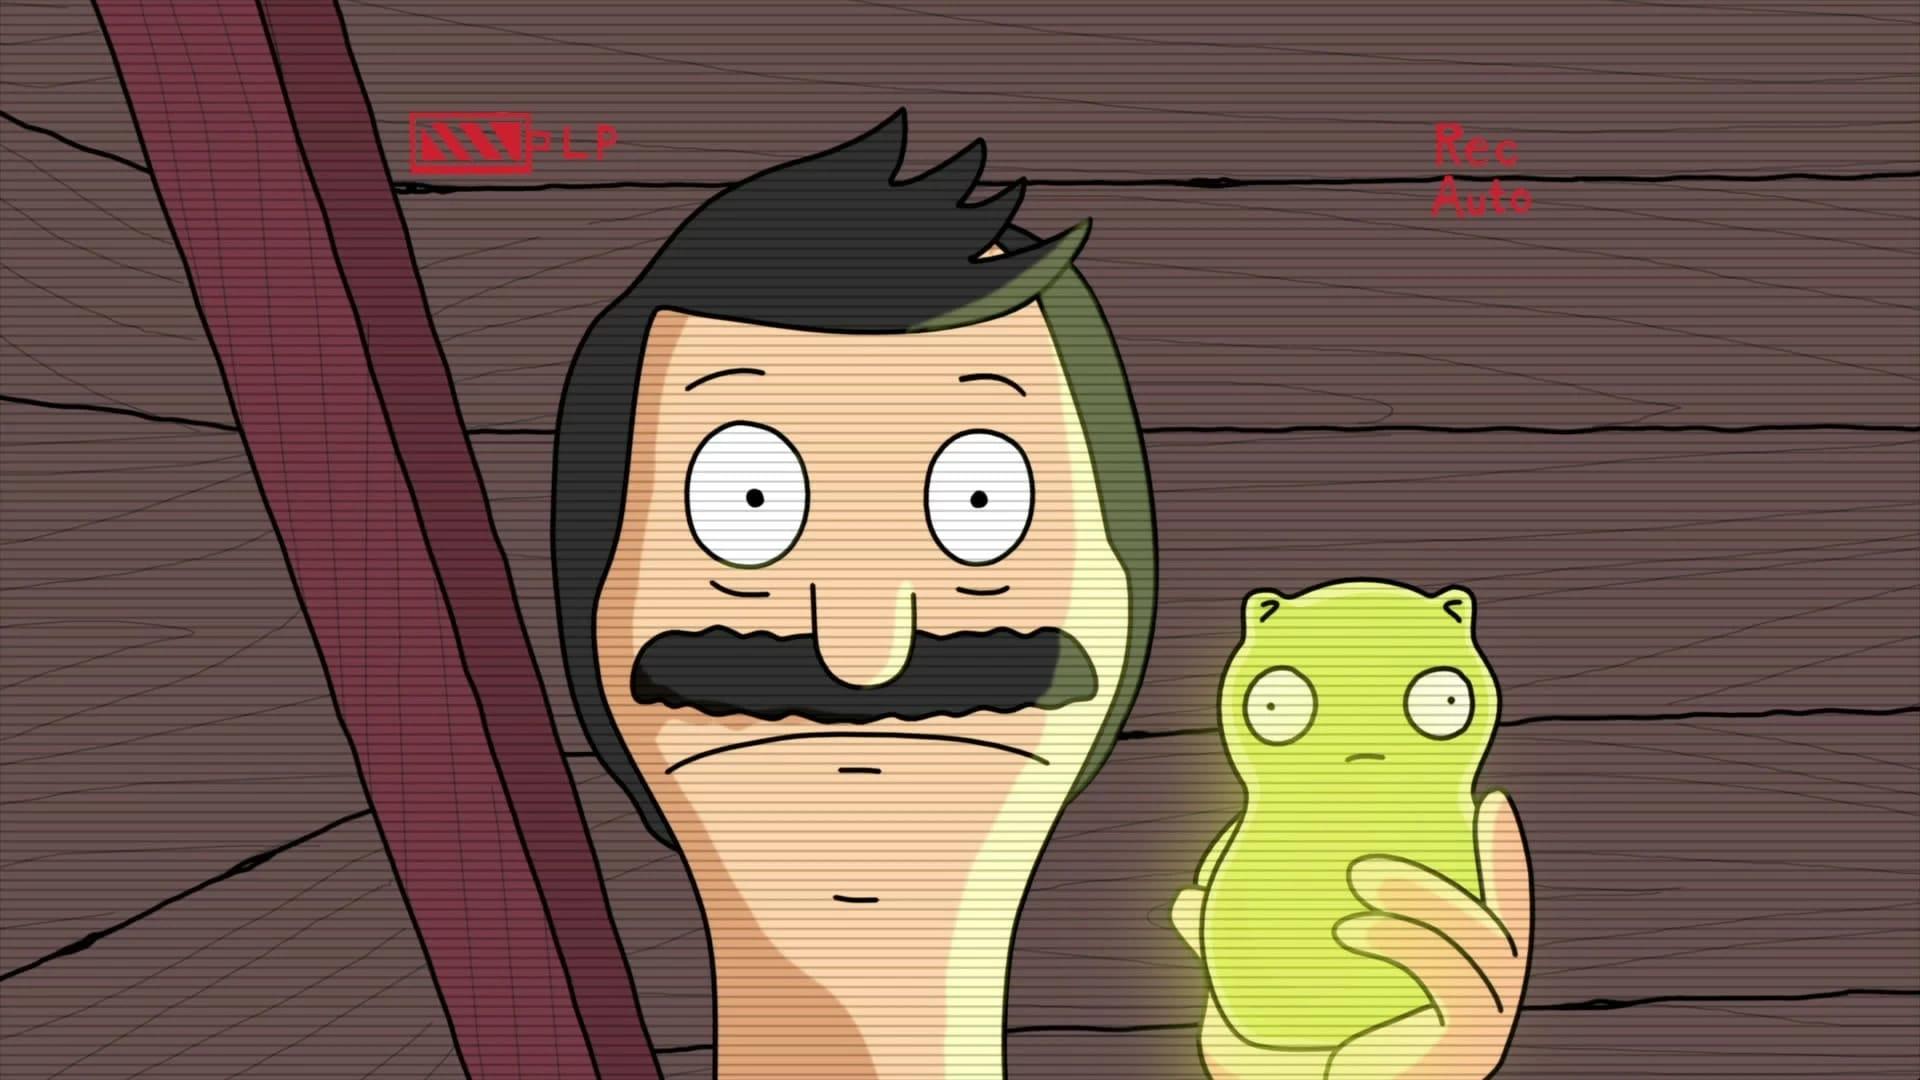 Bob's Burgers - Season 1 Episode 2 : Crawl Space